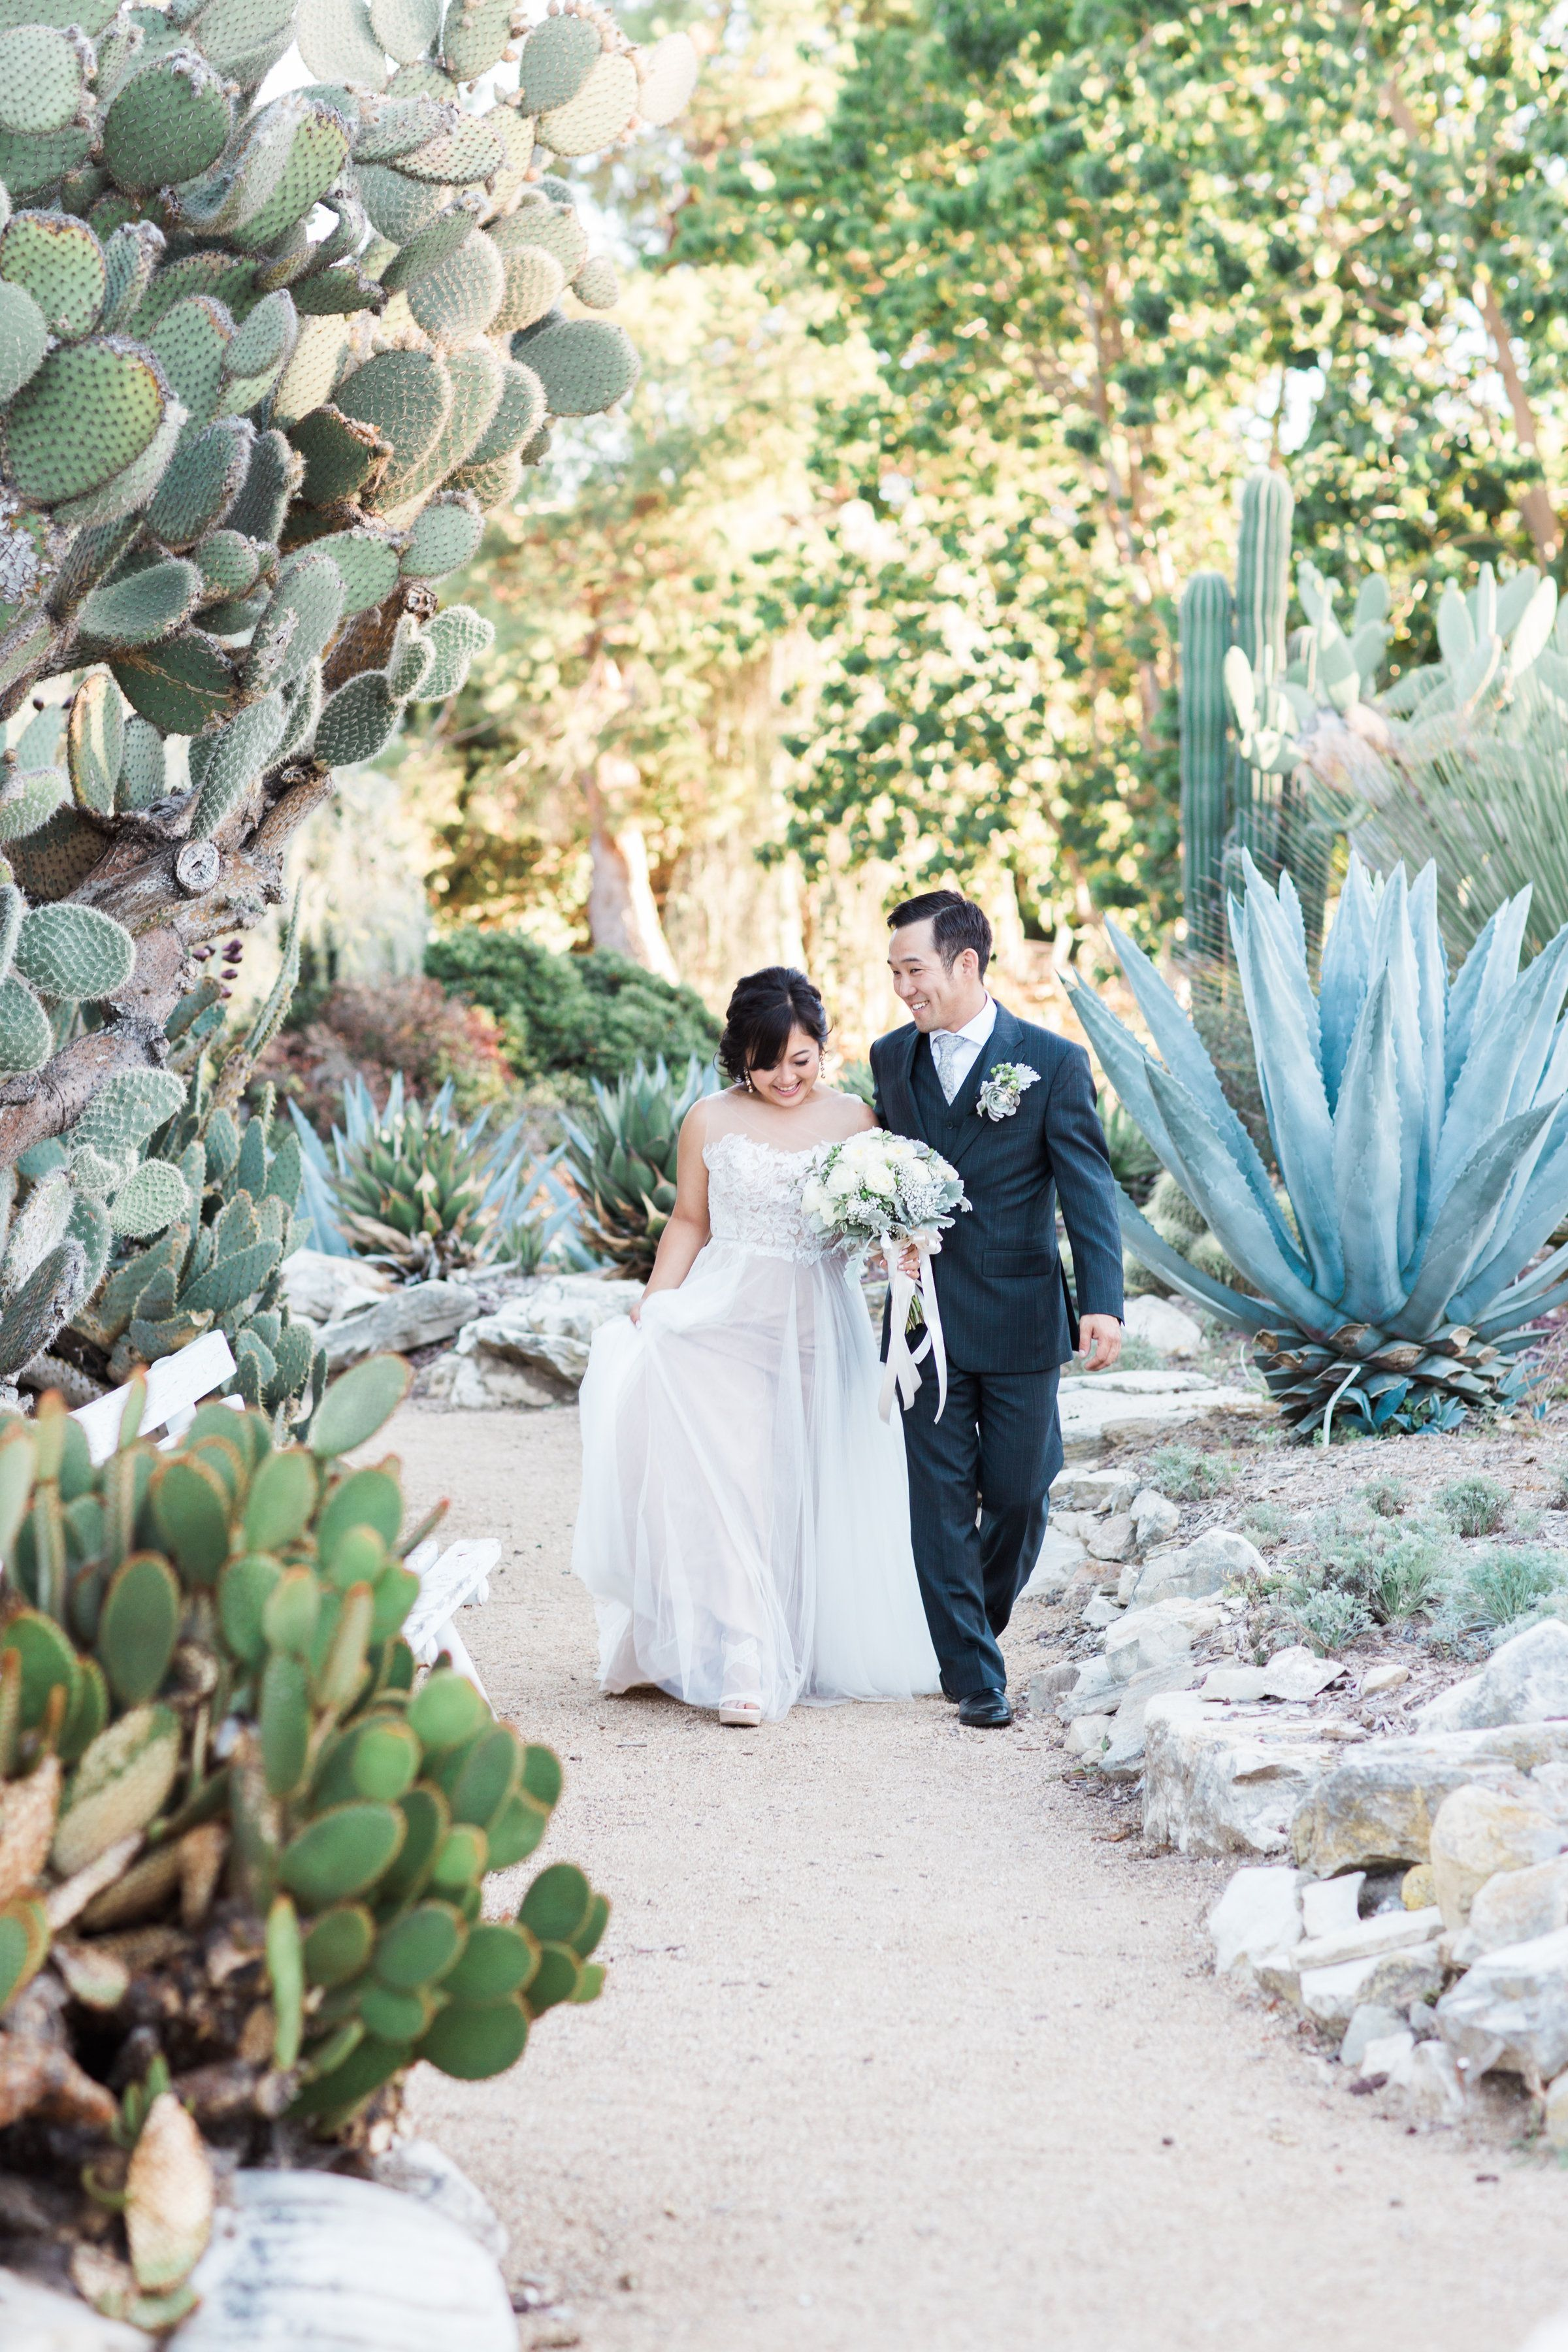 Fall Wedding at the South Coast Botanic Garden Cause We